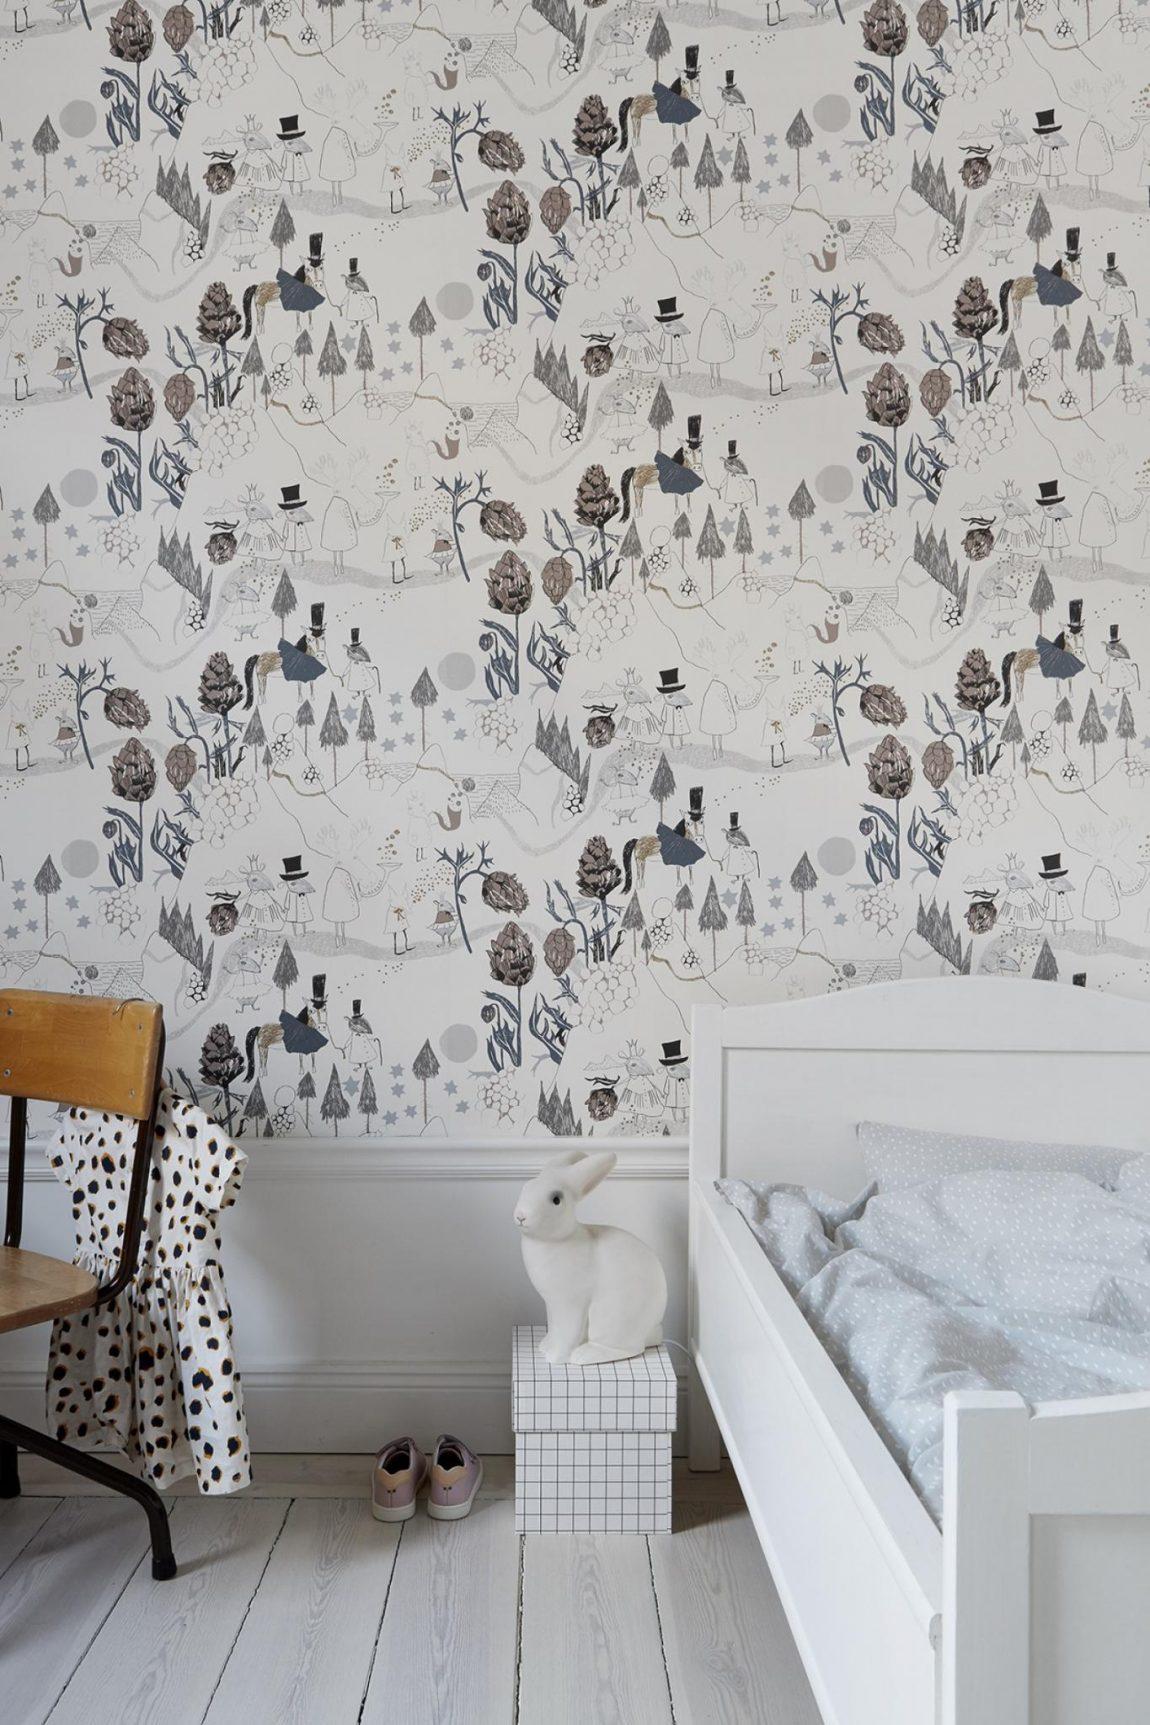 Leuke kinderkamer met leuk behang | Inrichting-huis.com